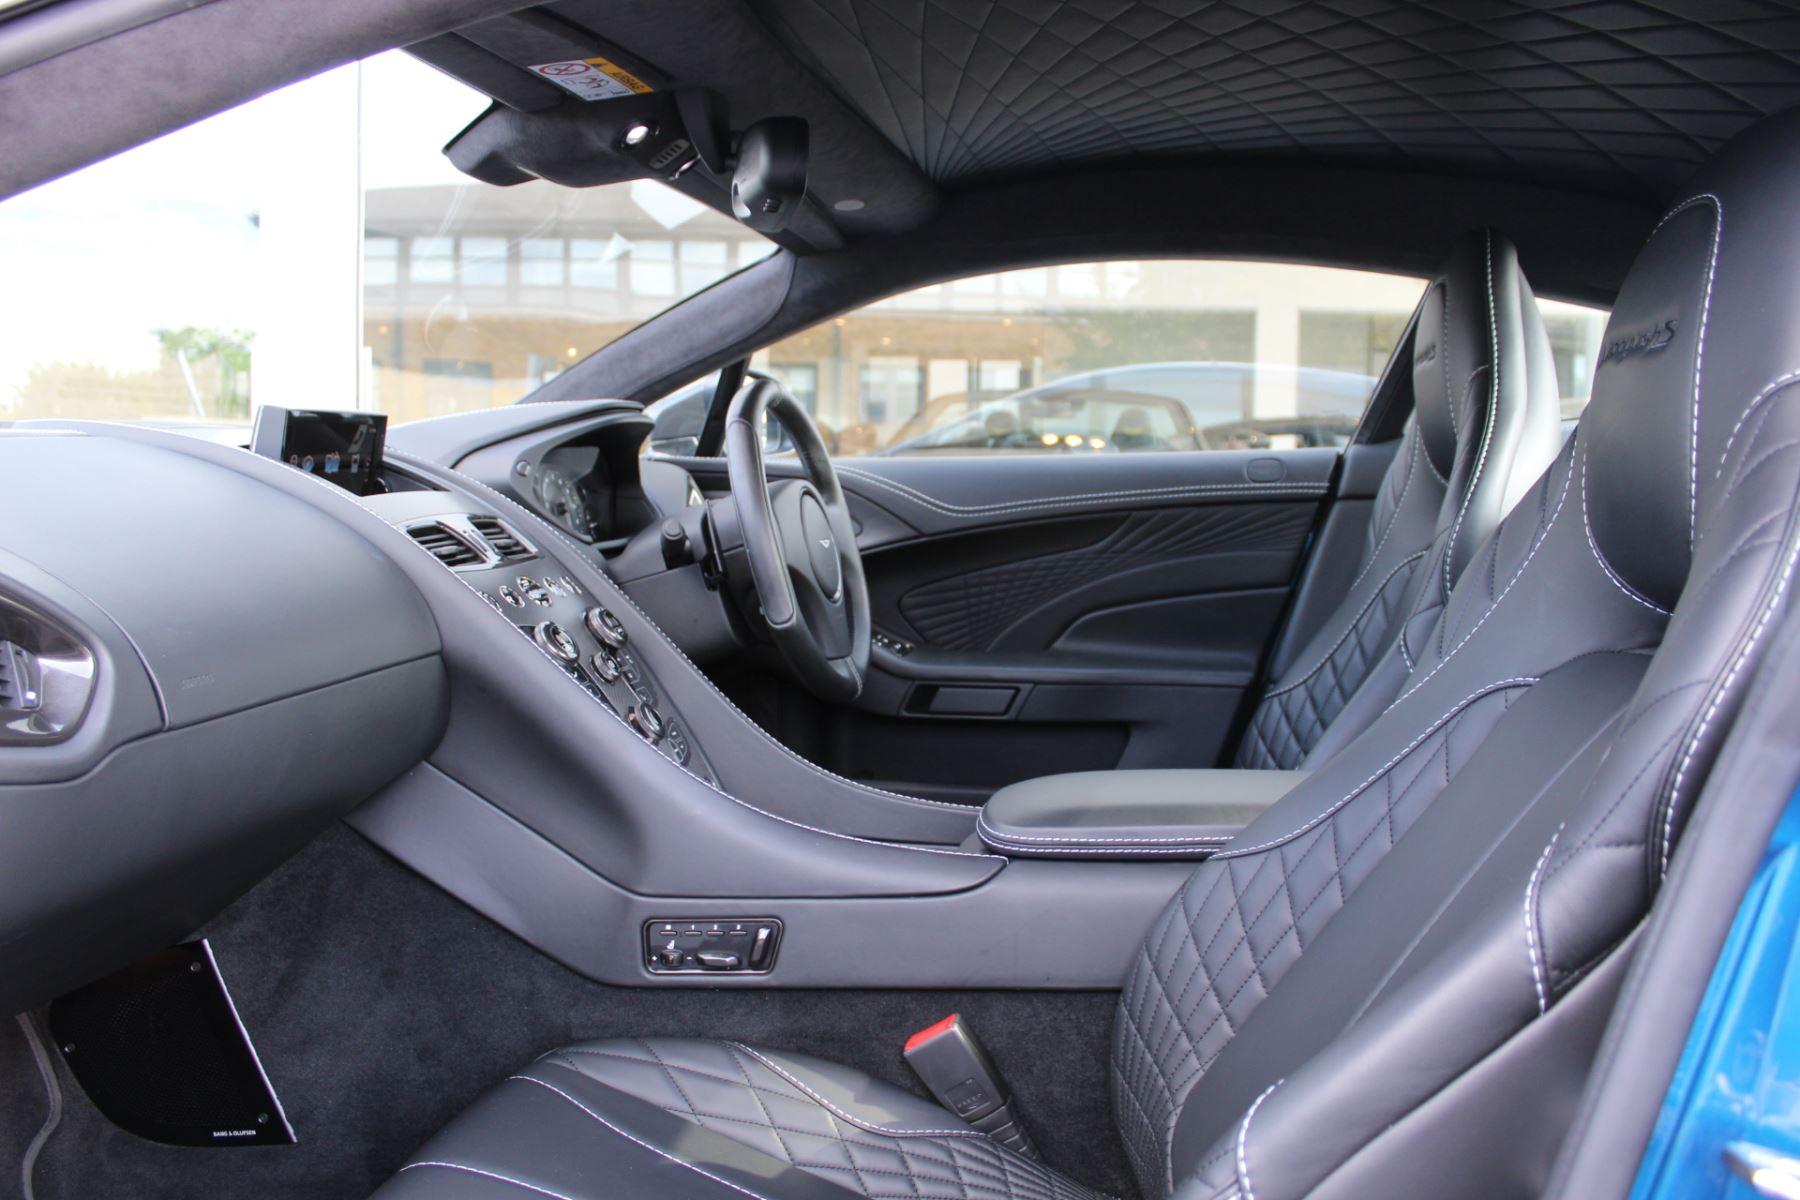 Aston Martin Vanquish V12 [595] S 2+2 2dr Touchtronic image 14